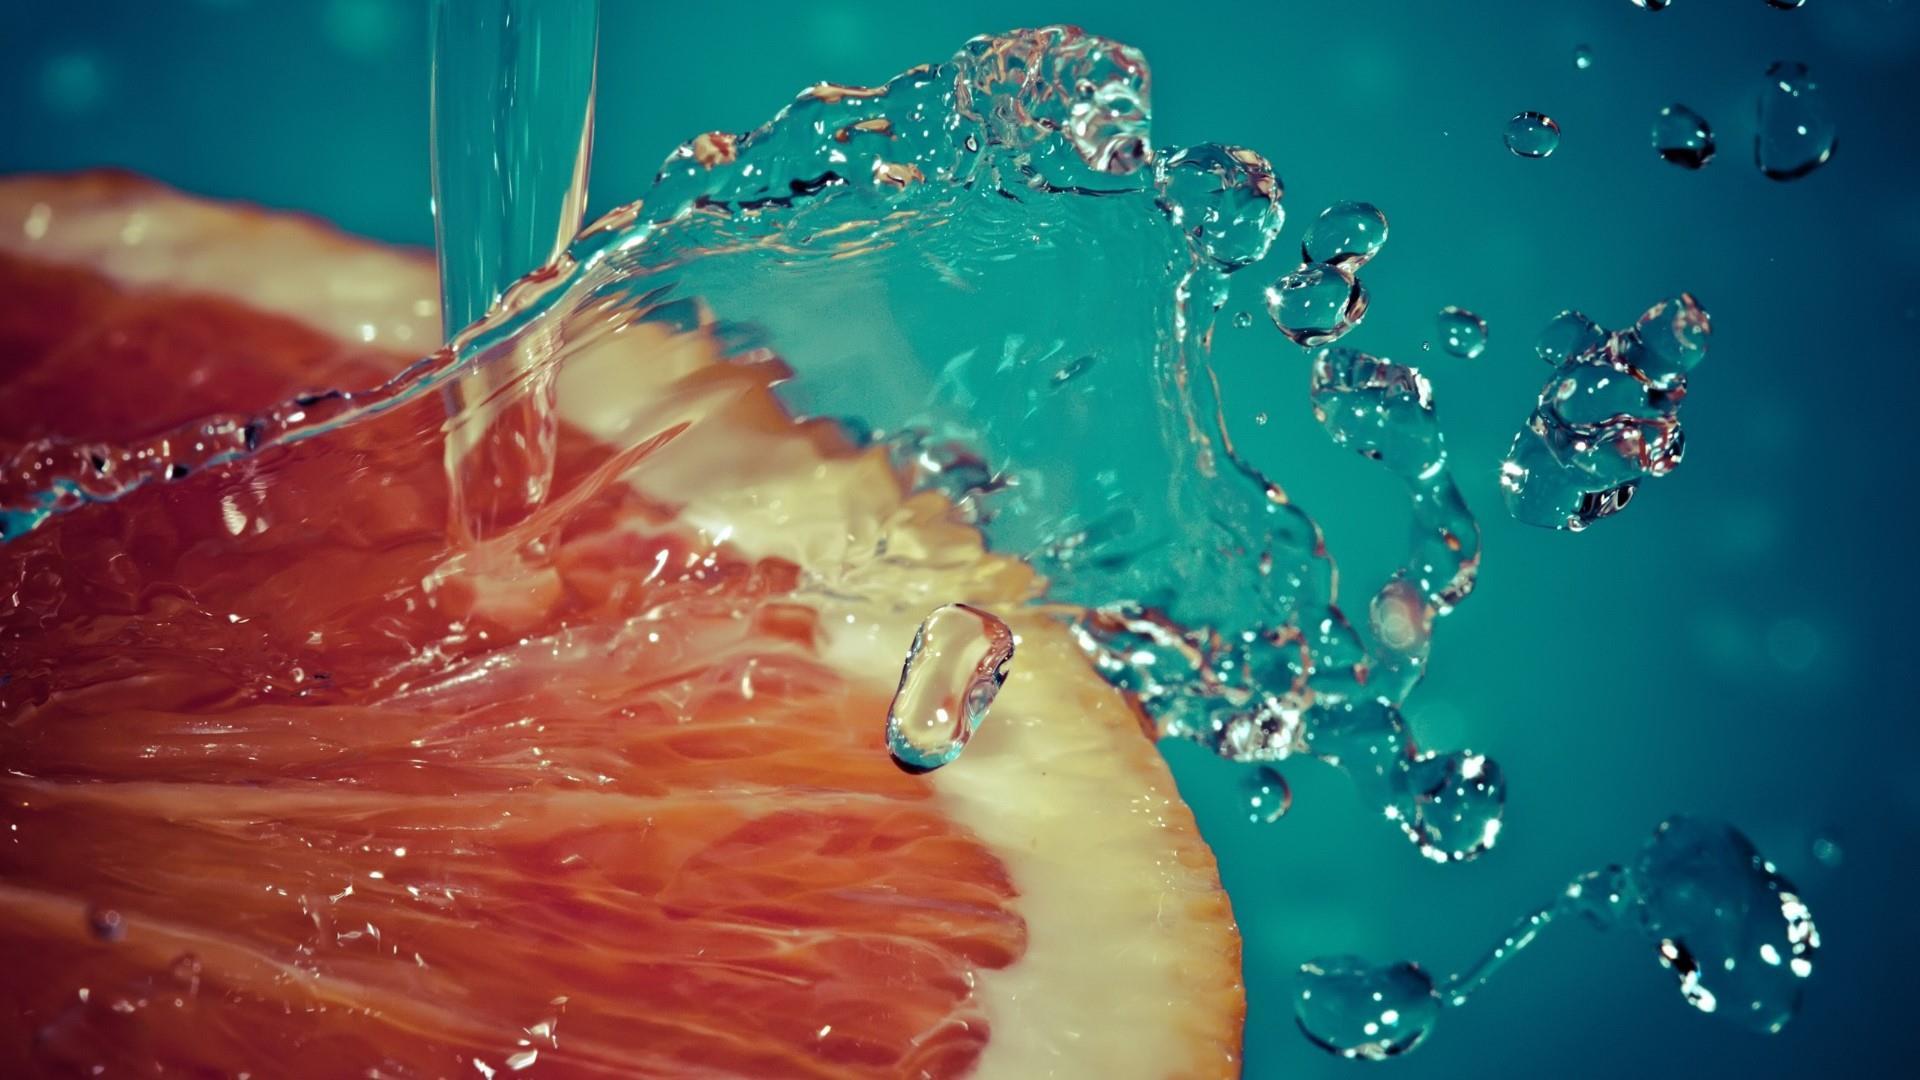 Waterdrops on orange wallpaper